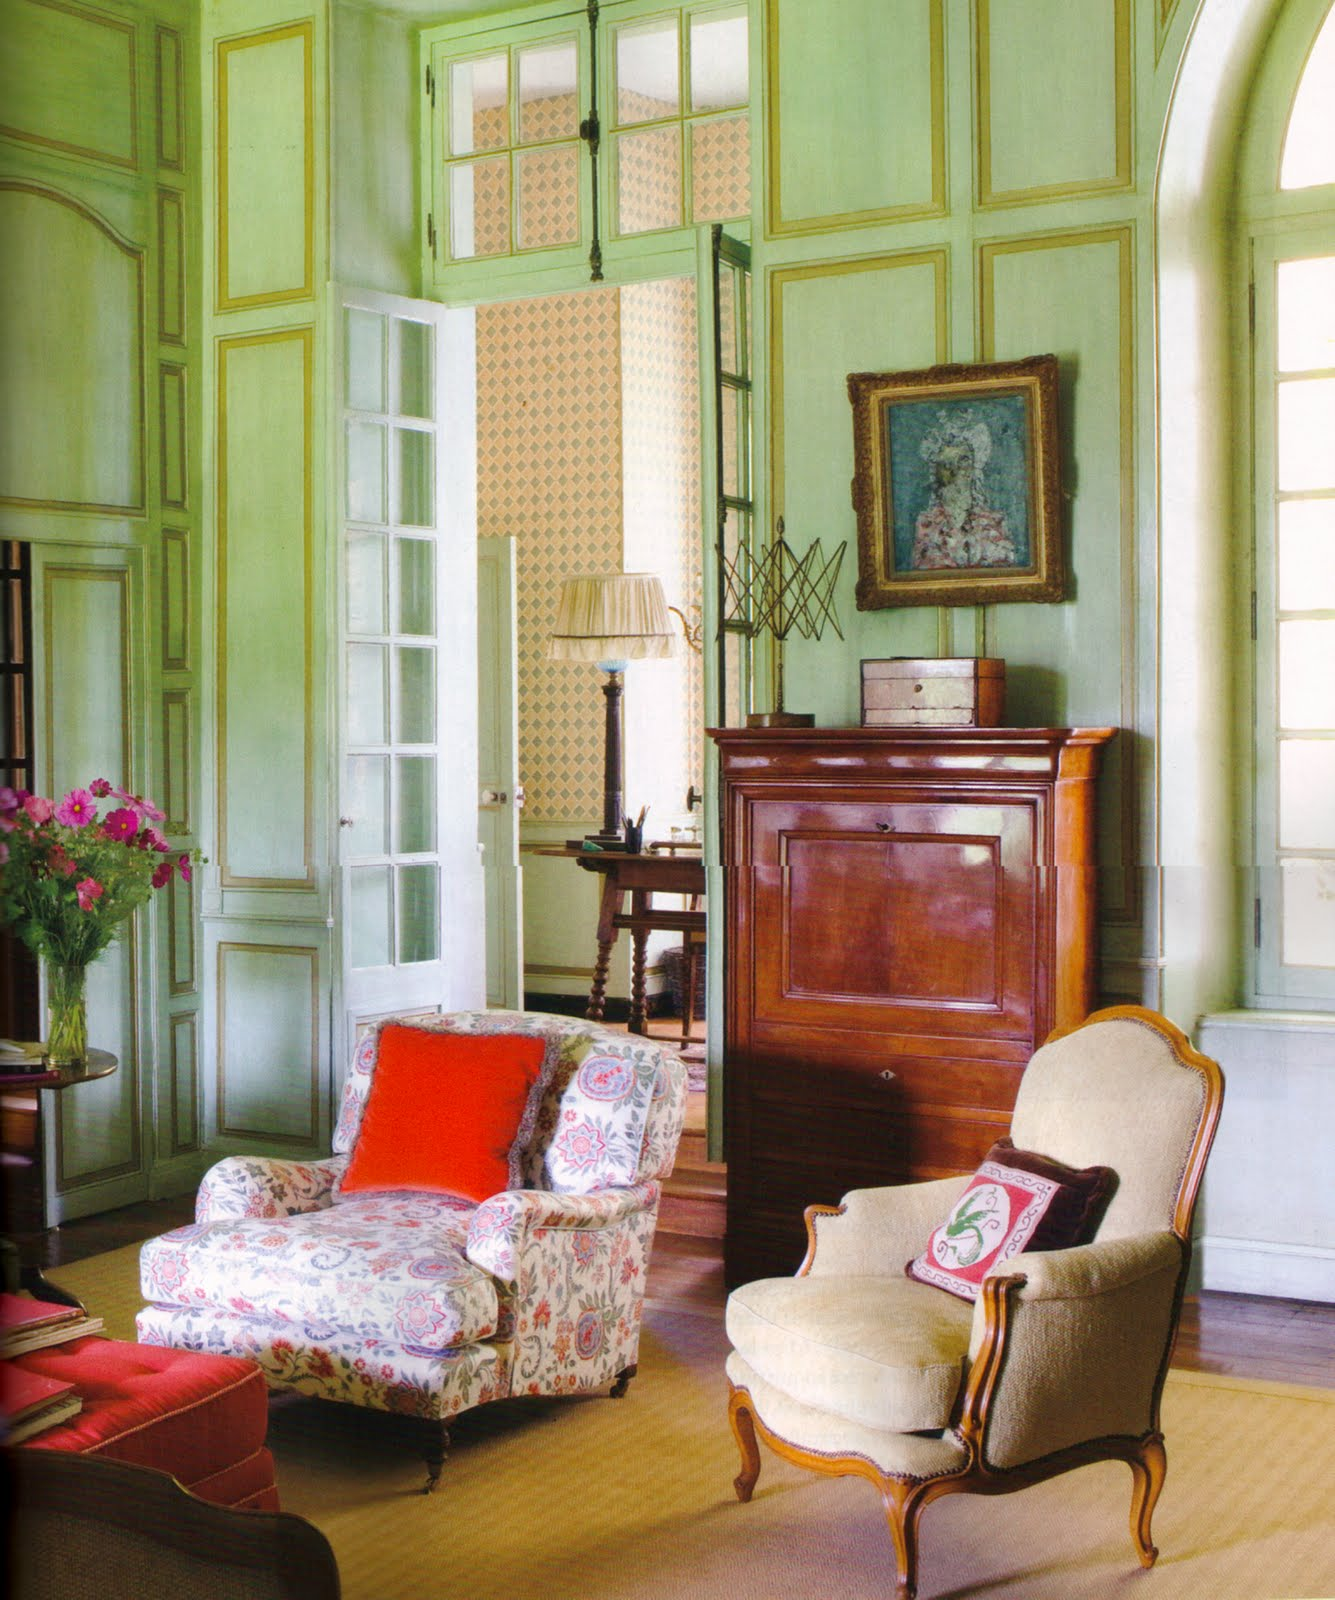 New Home Interior Design: New Home Interior Design: Andrew Raquet Interiors